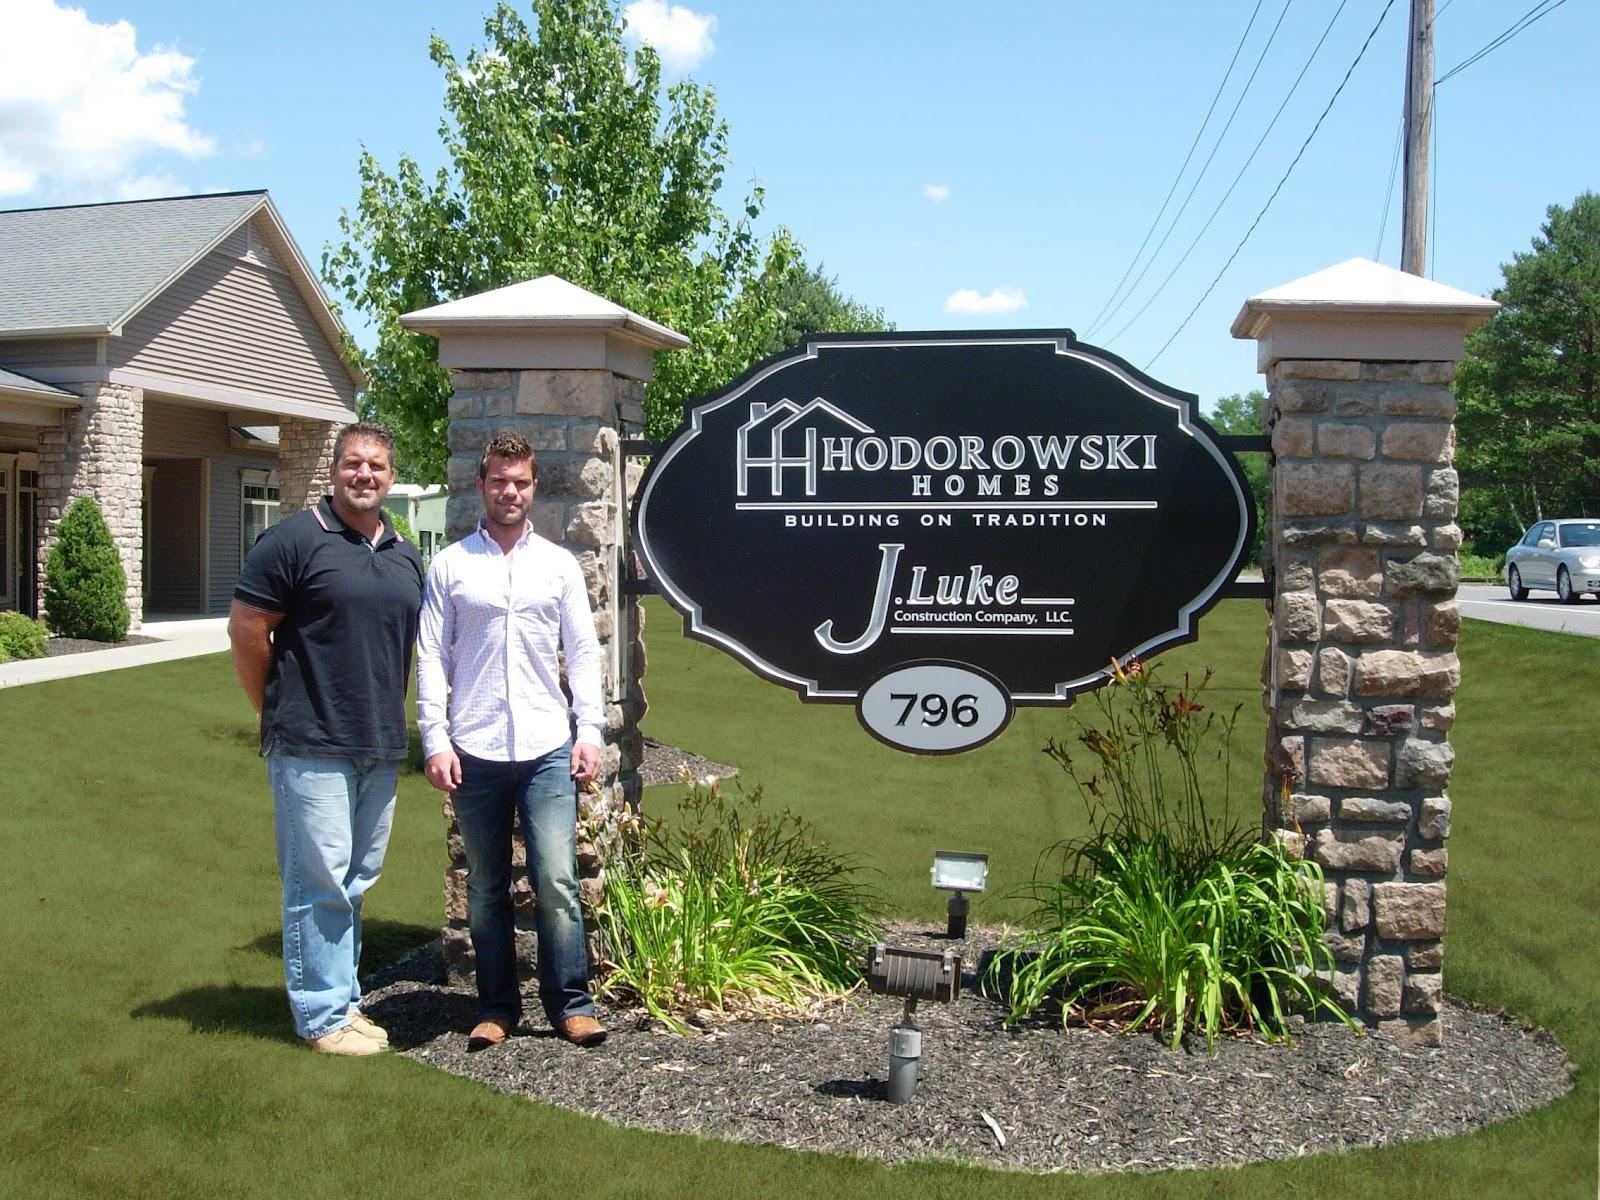 Hodorowski Homes August 2012